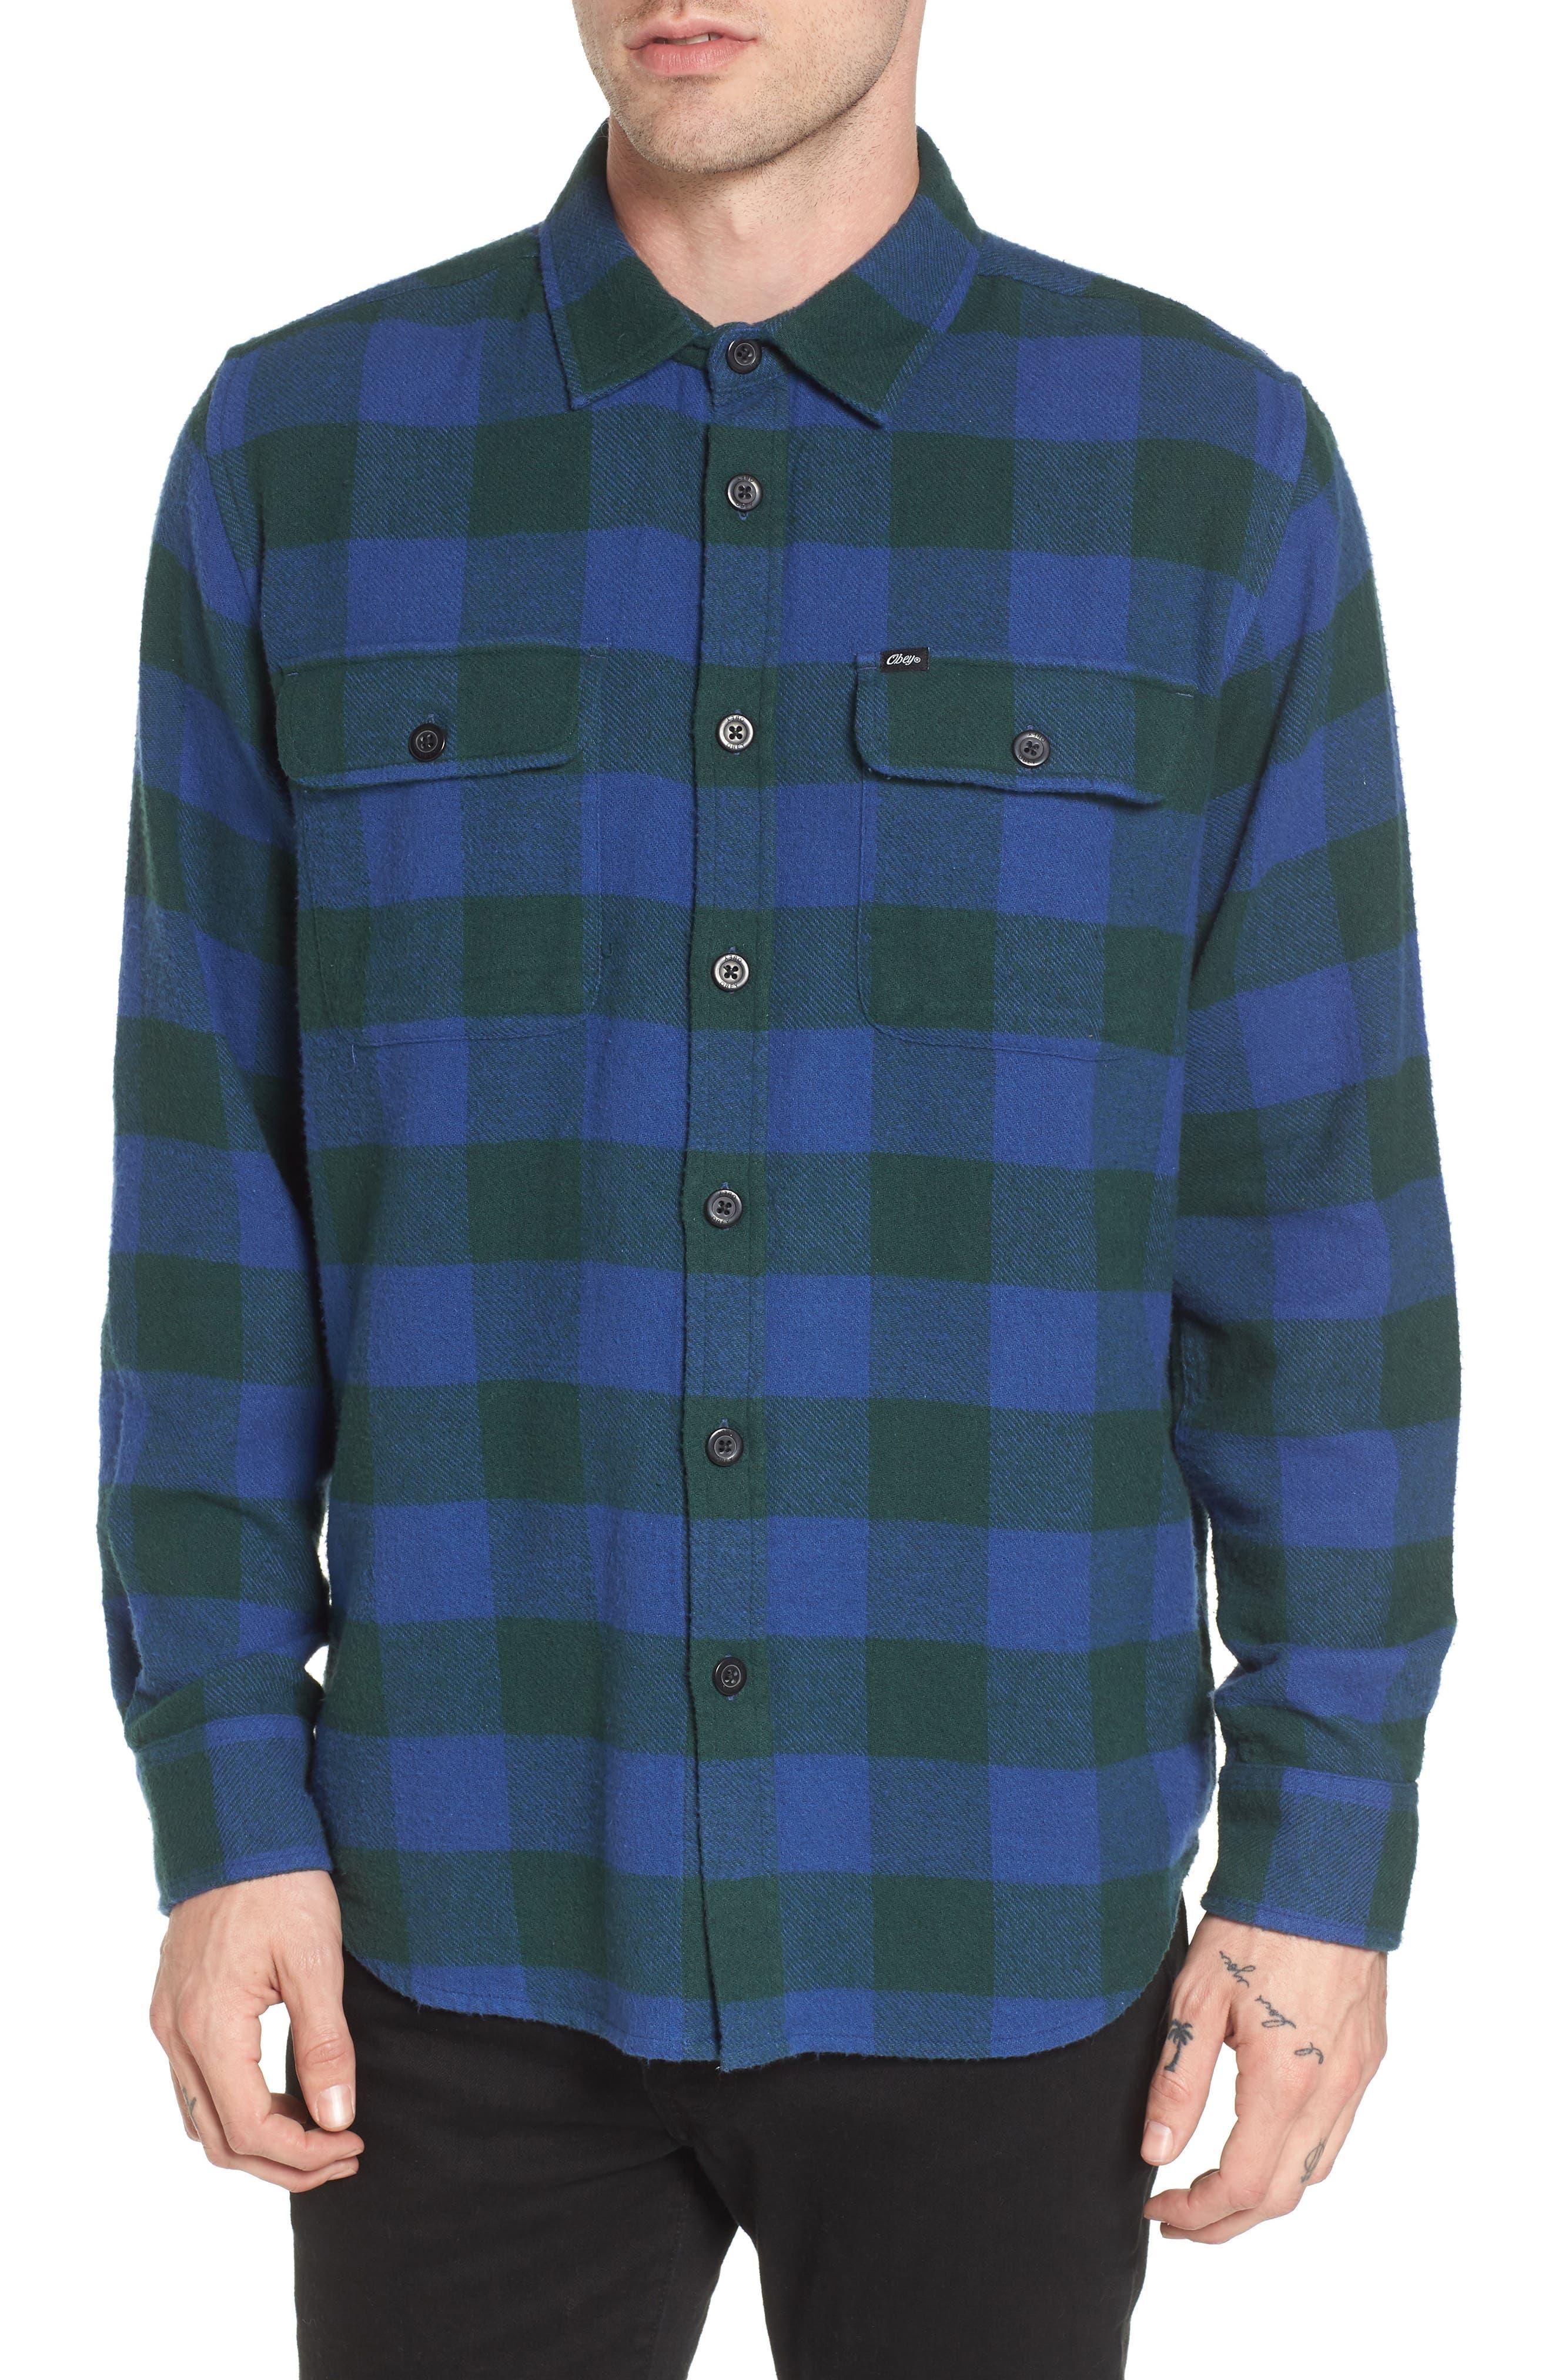 Trent Check Woven Shirt,                             Main thumbnail 1, color,                             Navy Multi